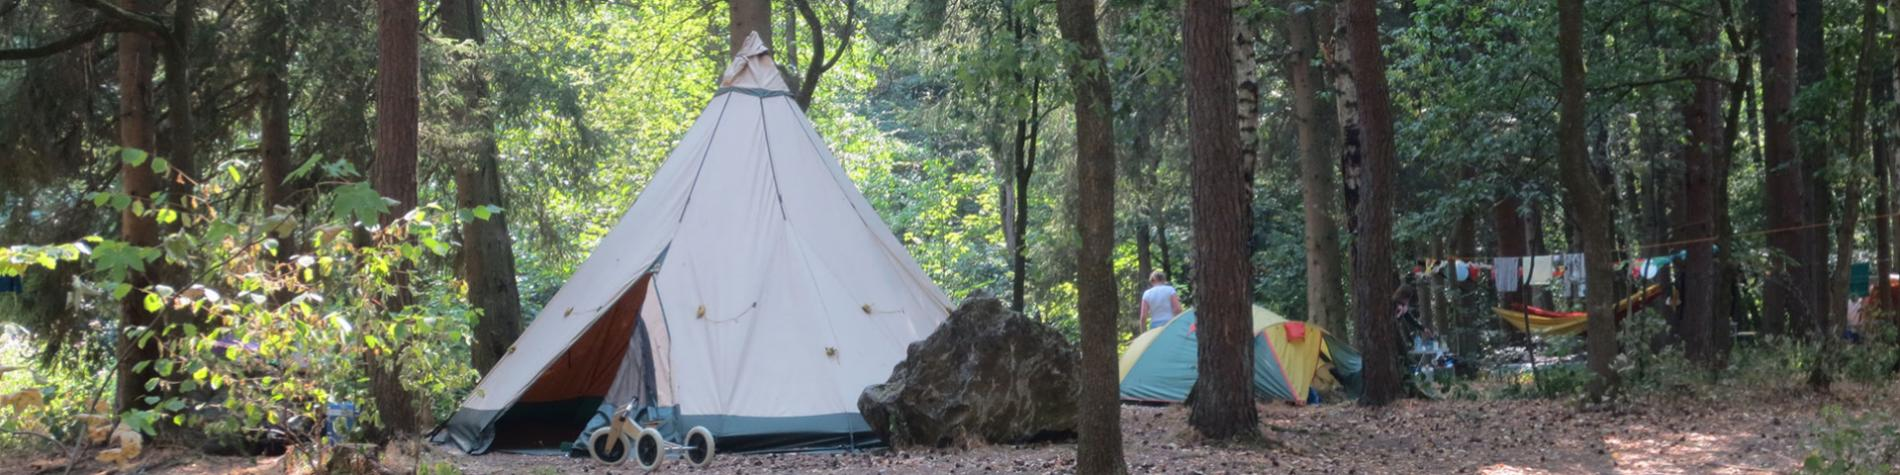 Camping - Wesertal - Baelen - Pays de Vesdre